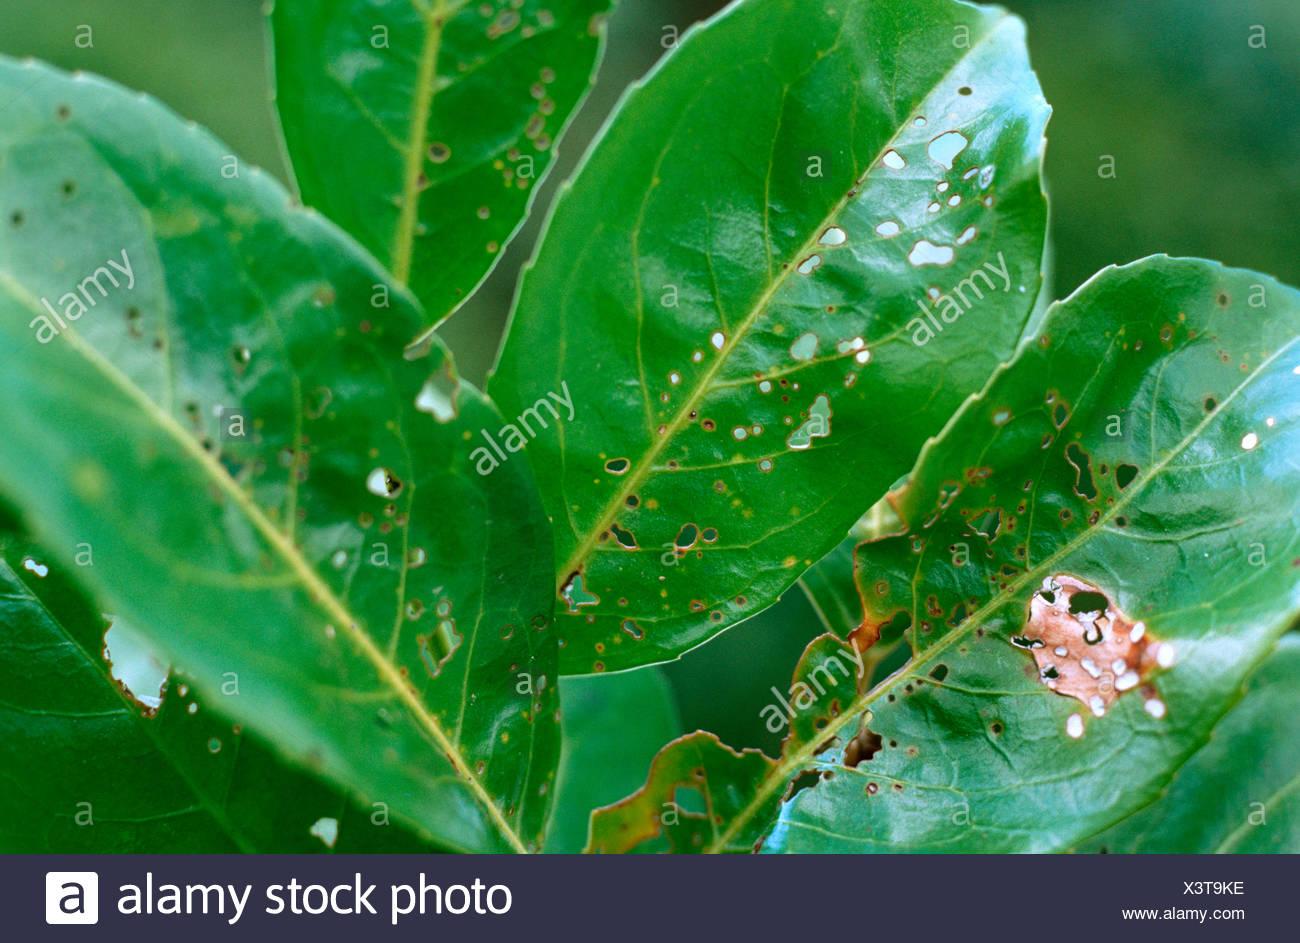 cherry-laurel (Prunus laurocerasus), with disease by Ascospora beijerinkii/Stigmina carpophila - Stock Image